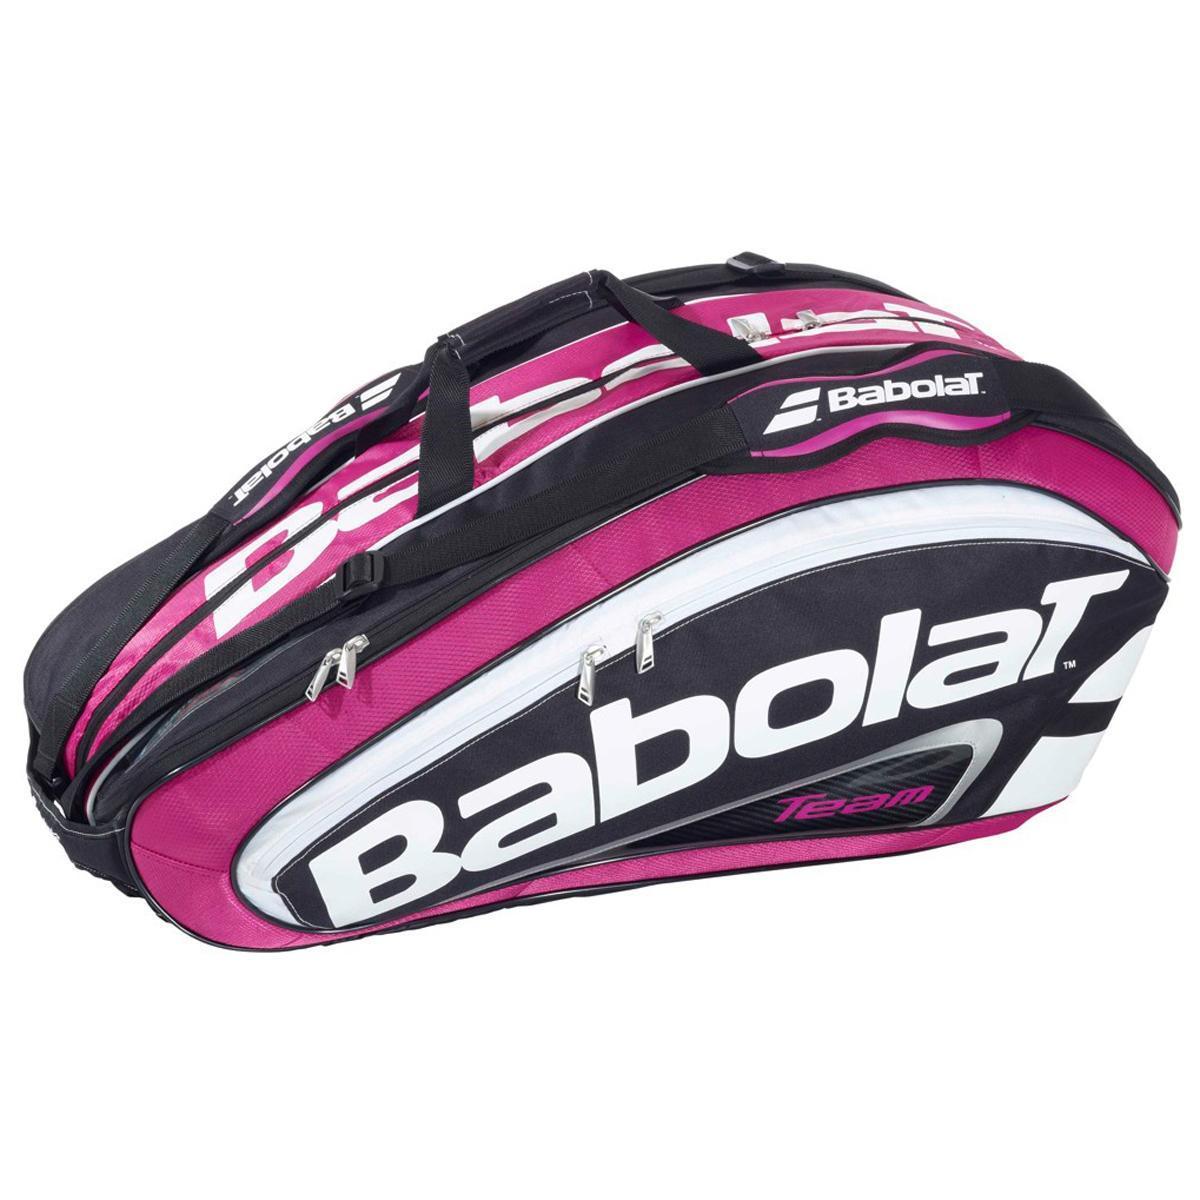 Babolat Team Line 12 Racket Tennis Bag - Pink - Tennisnuts.com